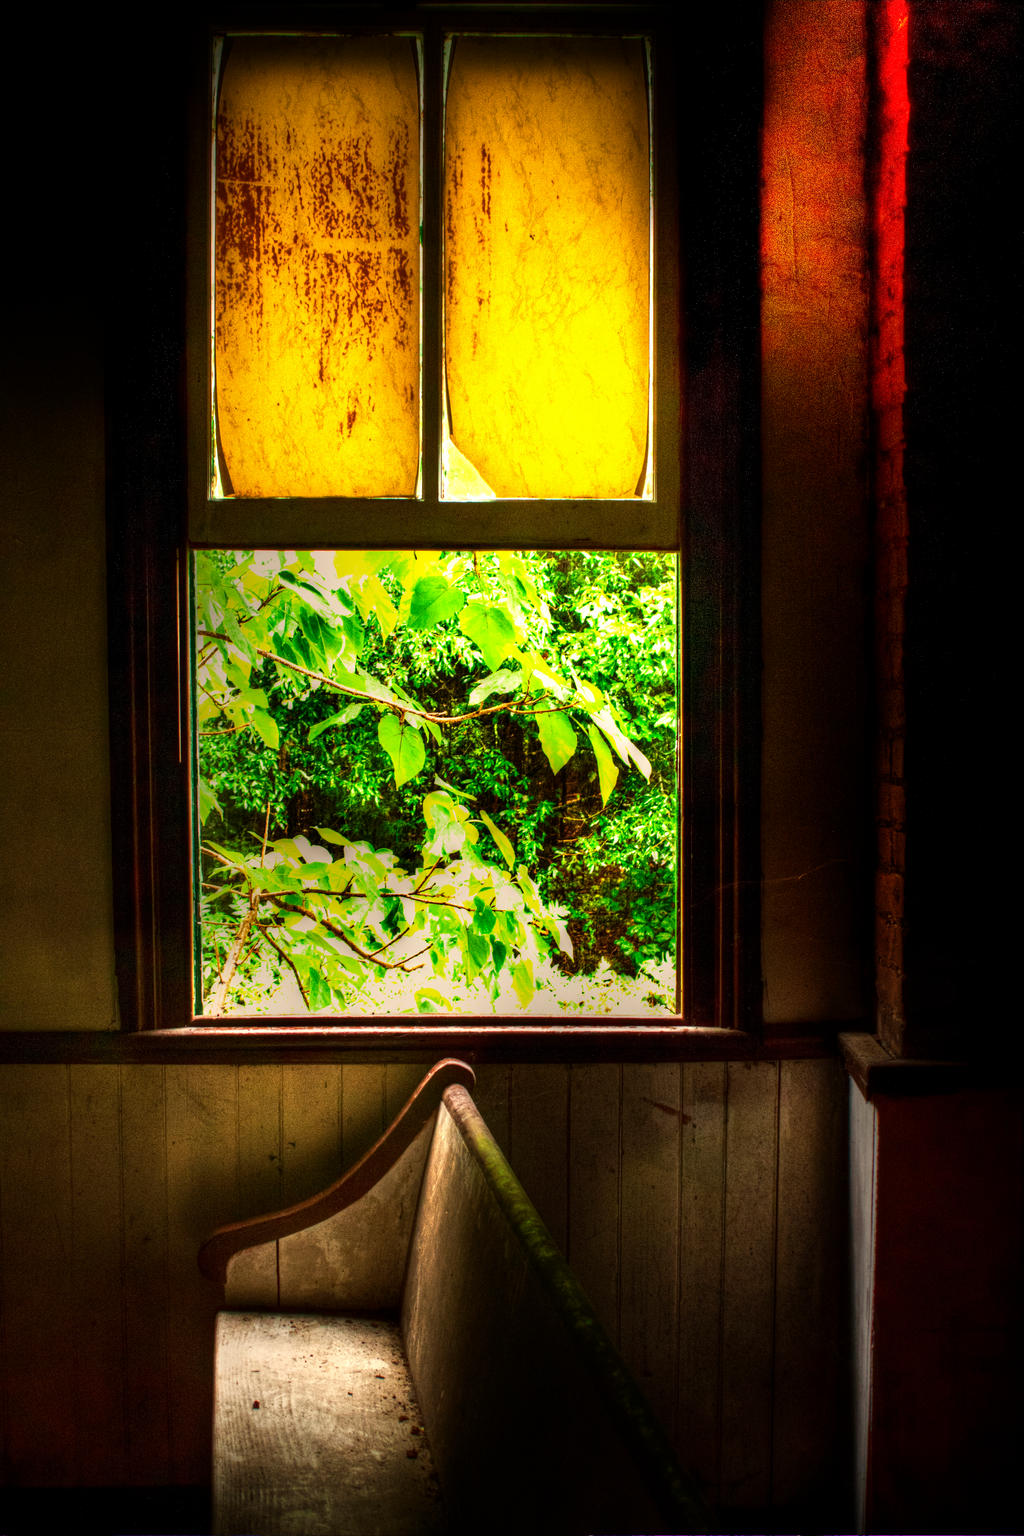 Can you feel the Glow? by dementeddiva23